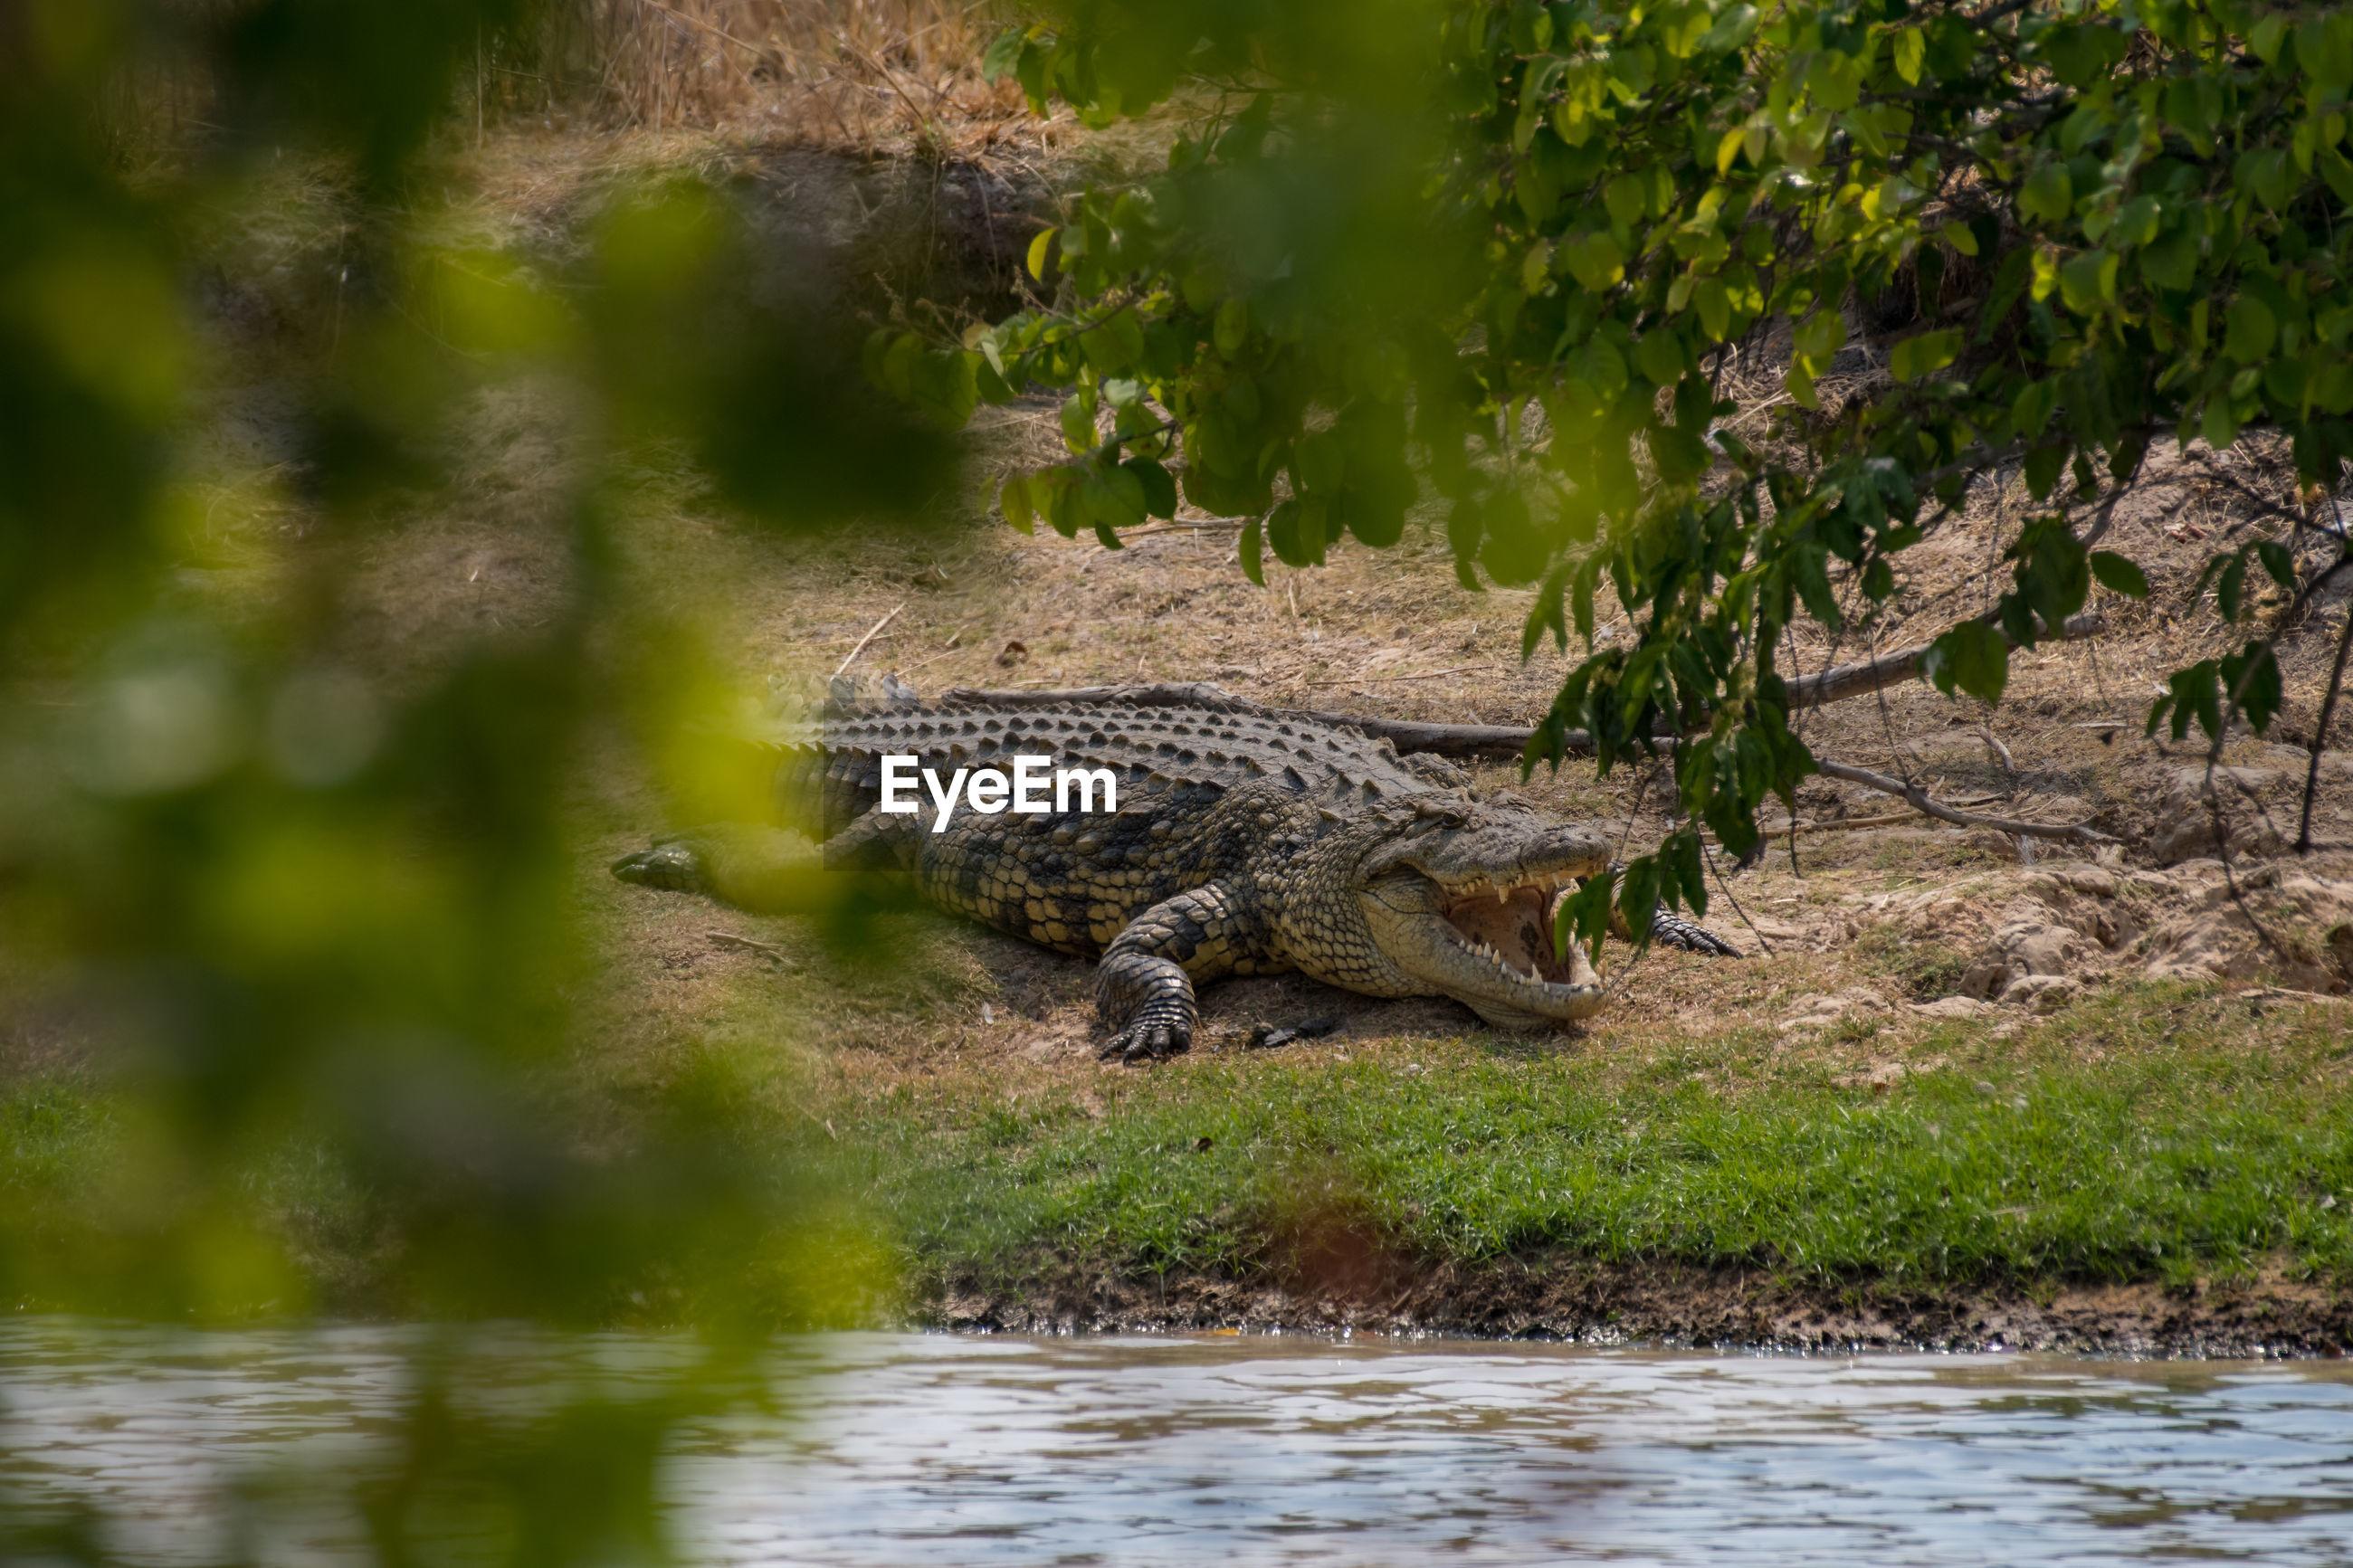 View of a vegetarian crocodile on riverbank